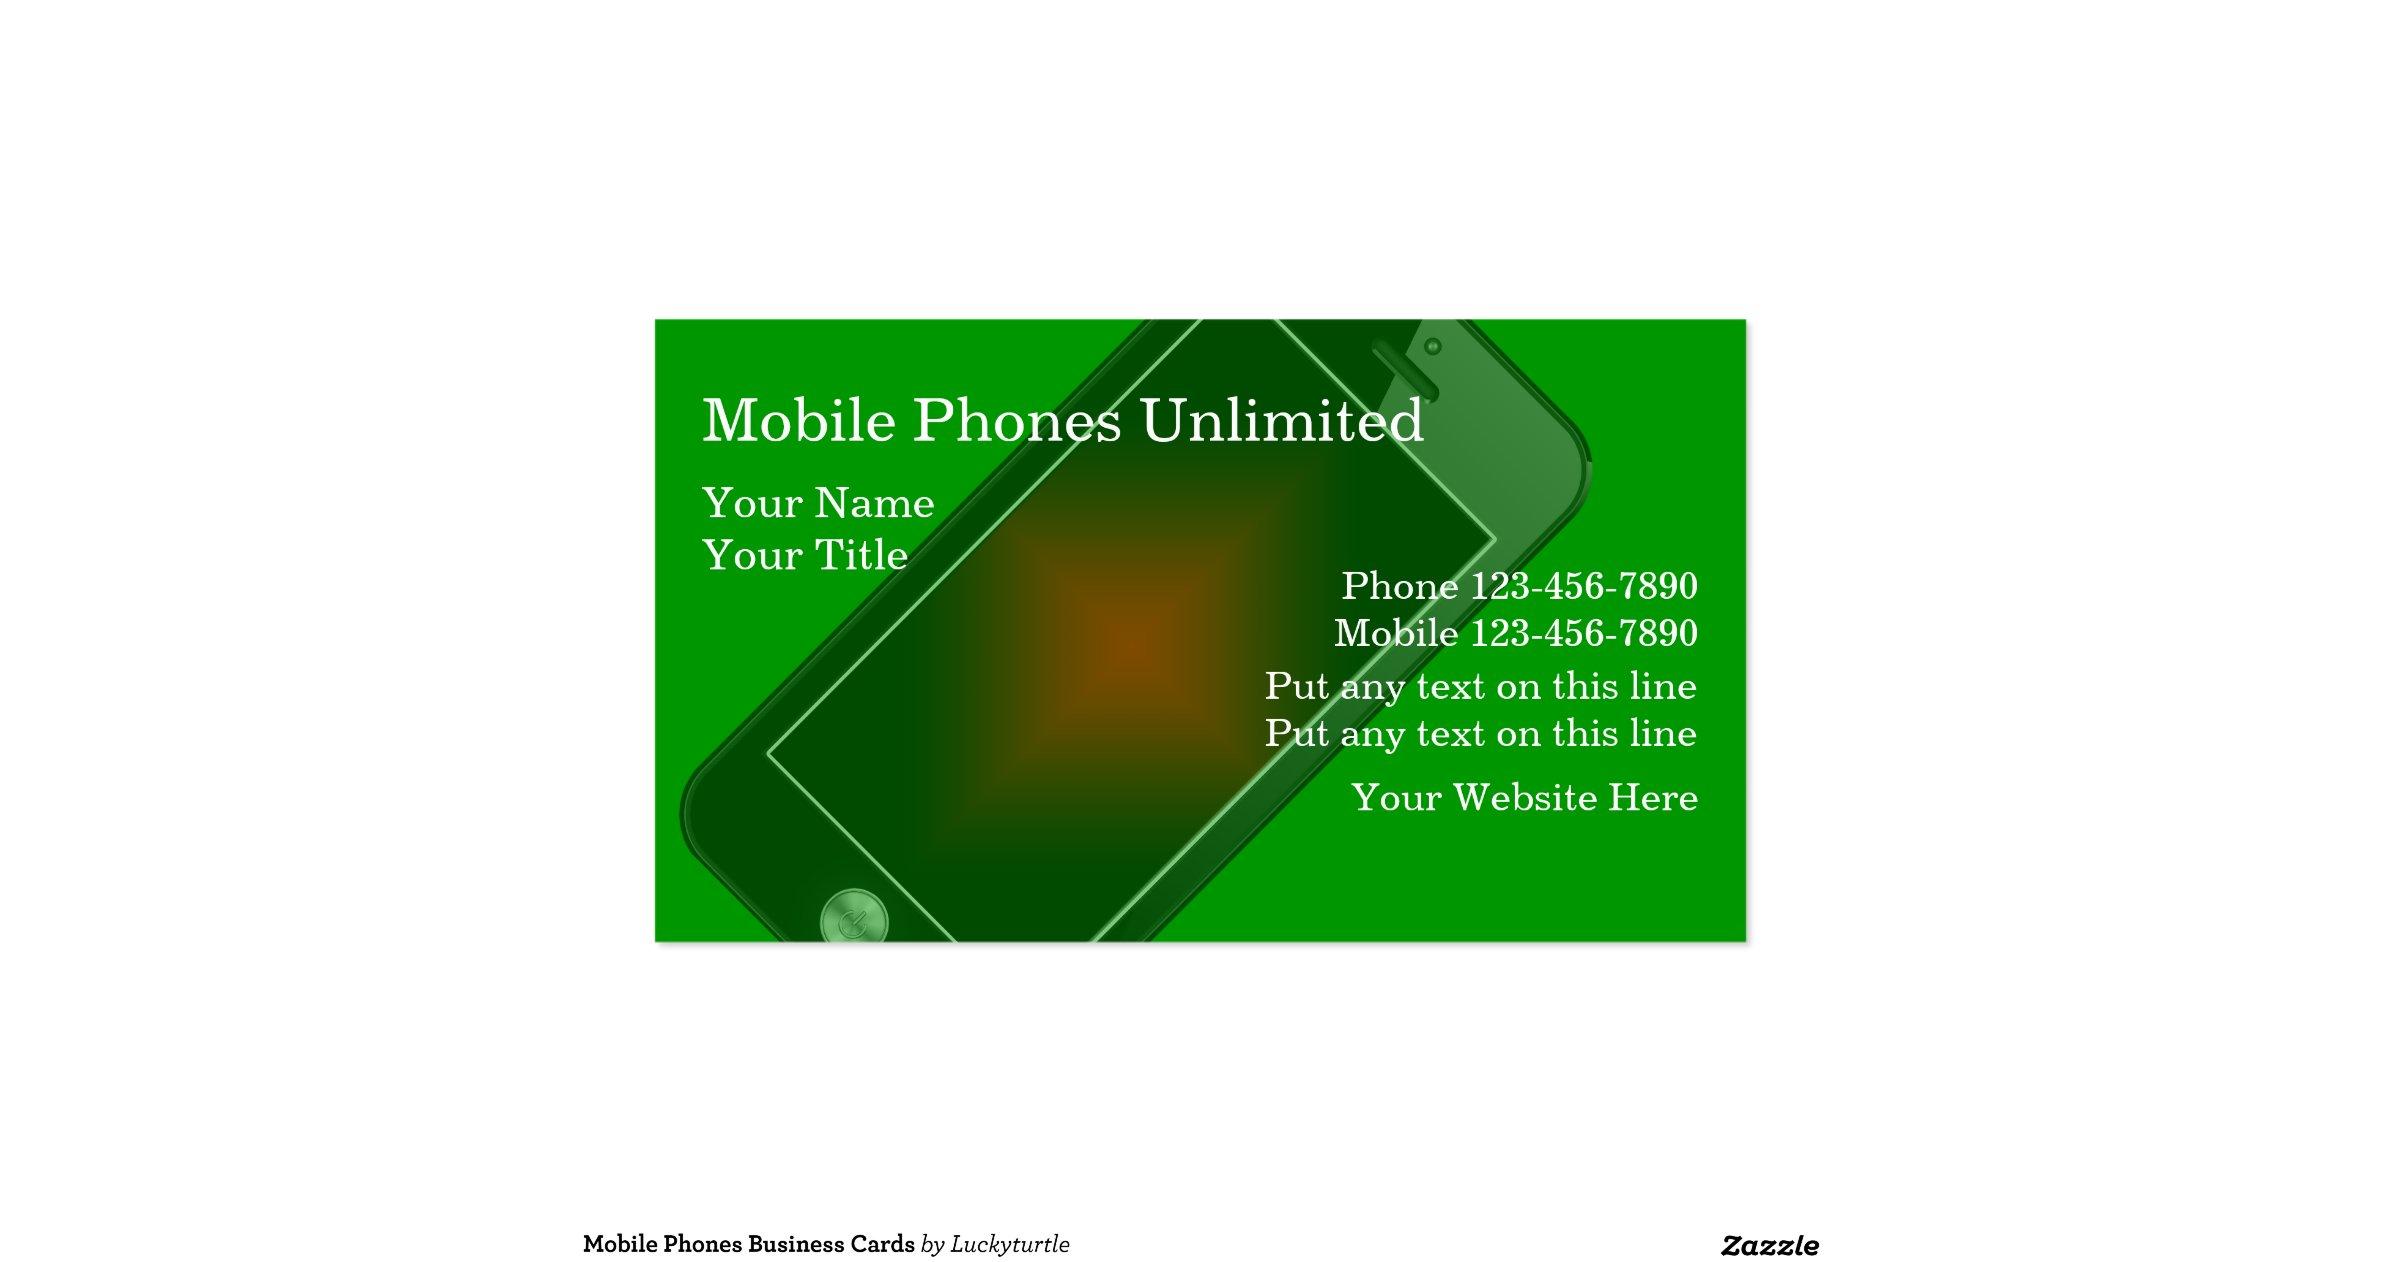 mobile phones business cards zazzle. Black Bedroom Furniture Sets. Home Design Ideas